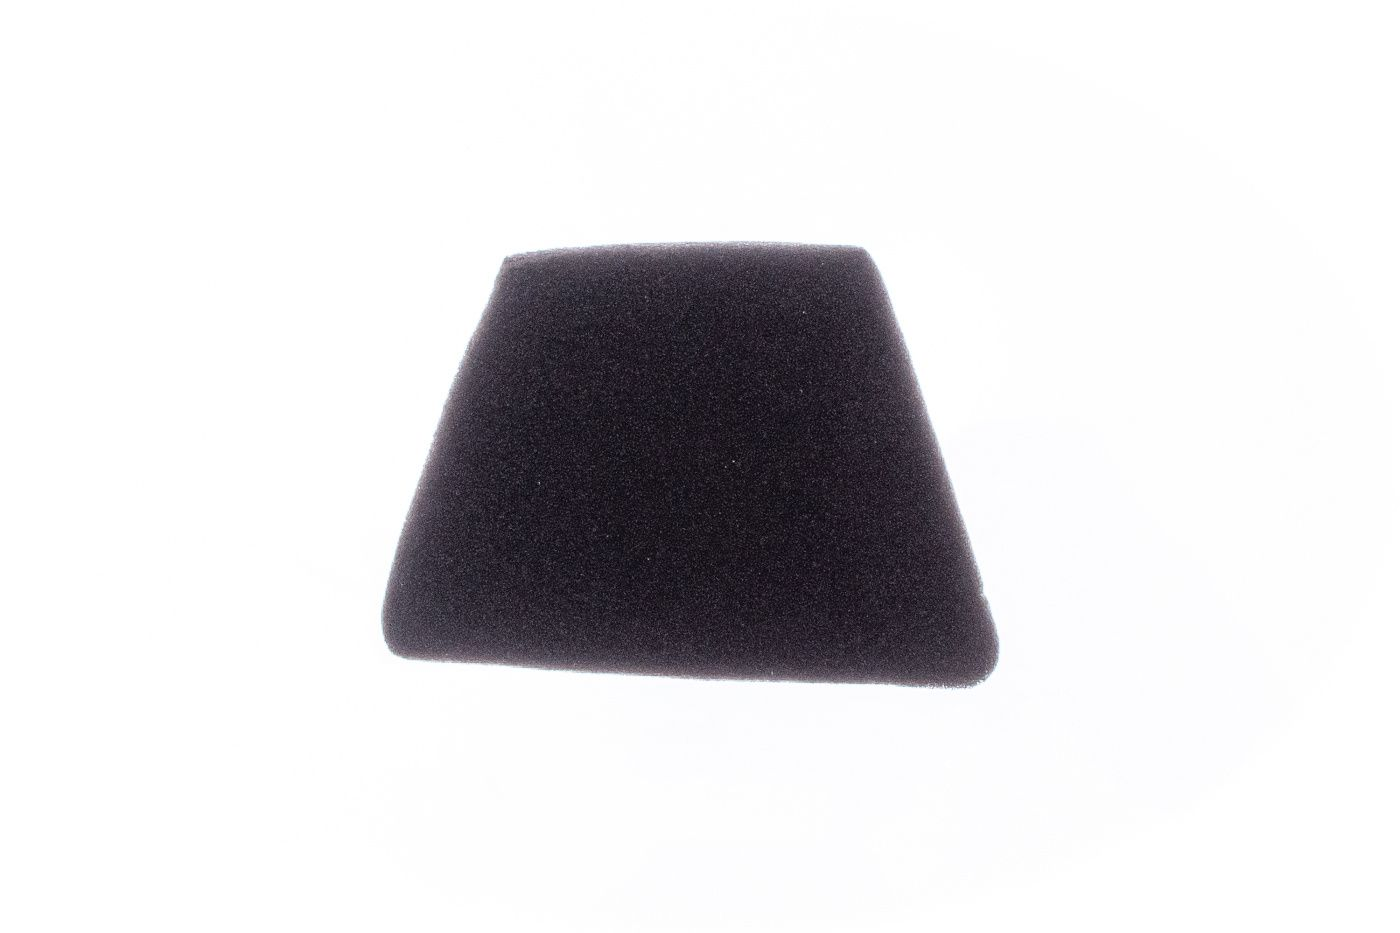 Vzduchový filter PARTNER 351 - 530037793